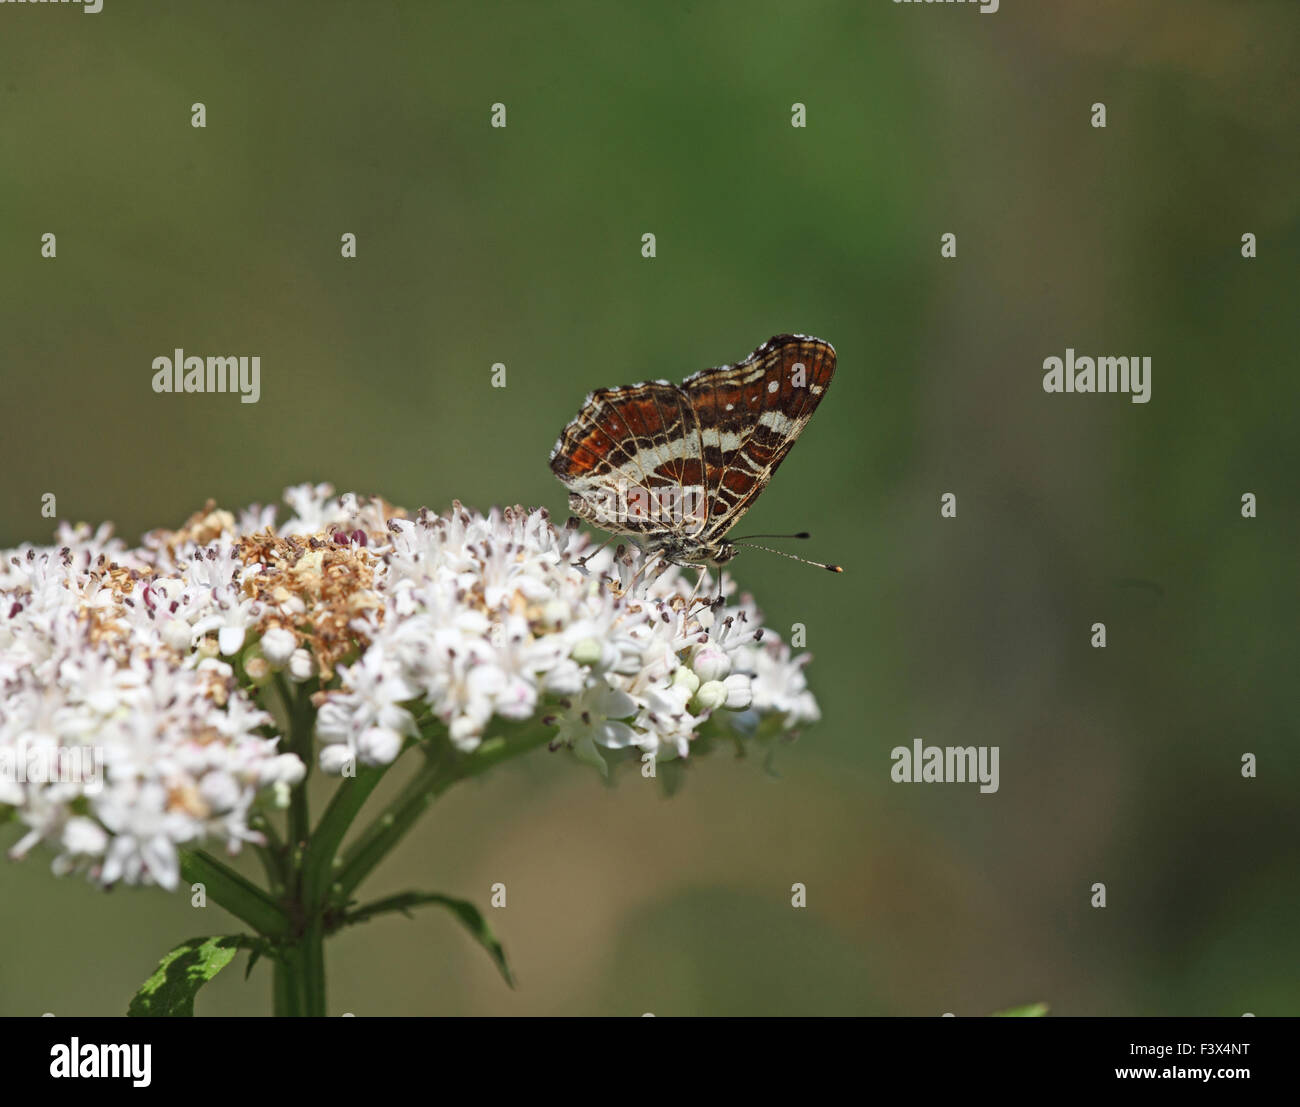 Taking nectar from scrub elder Hungary June 2015 - Stock Image